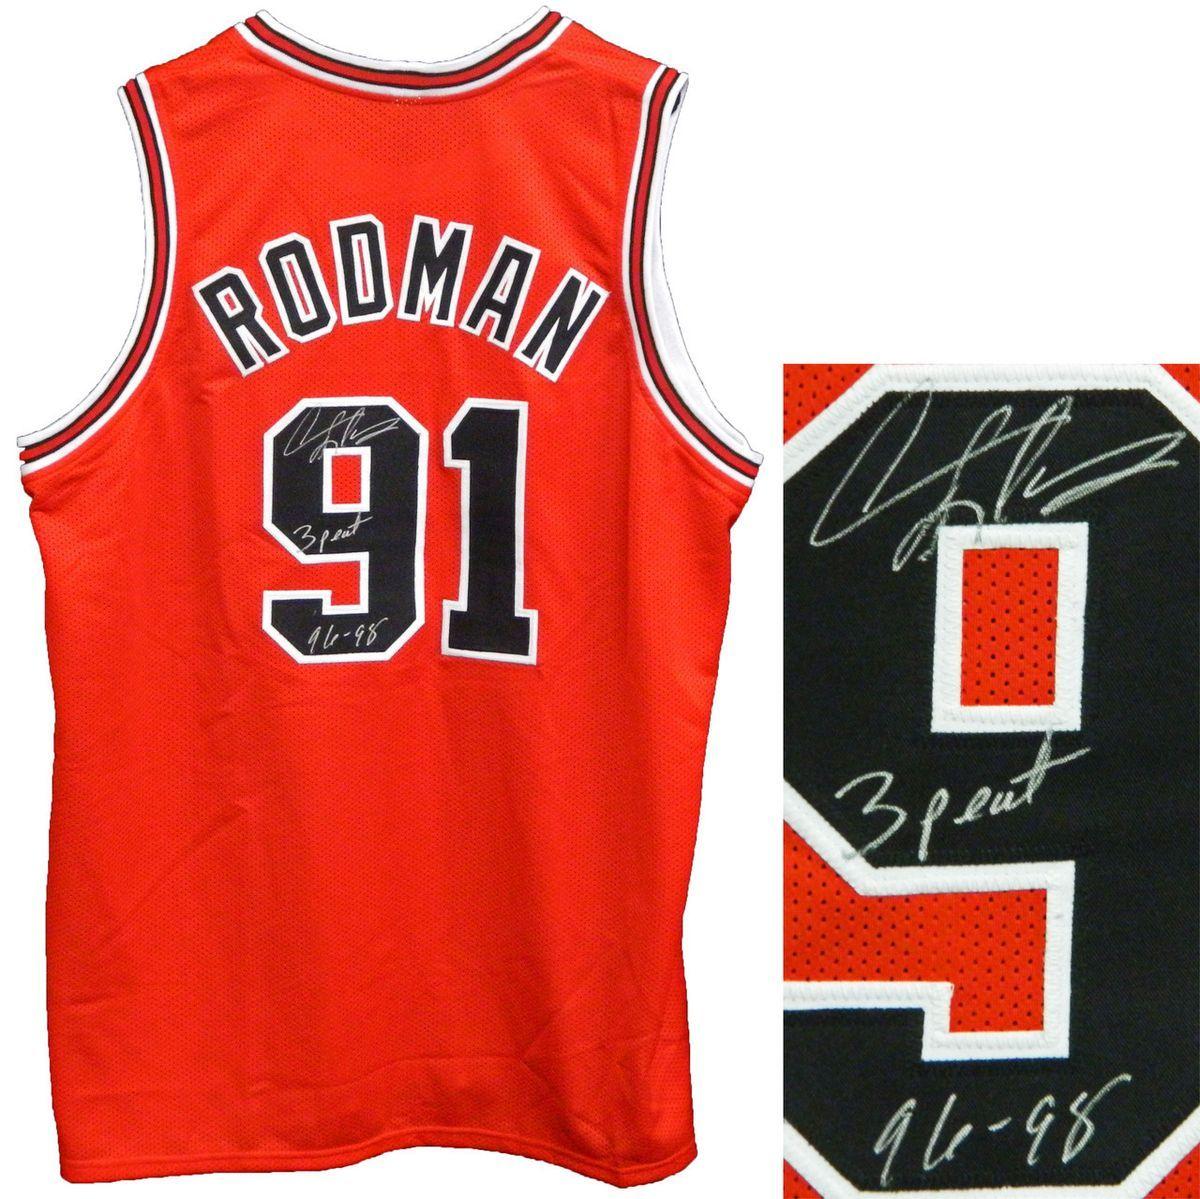 quality design 1c36a 1d8be Dennis Rodman Signed Chicago Bulls Red Throwback Custom ...